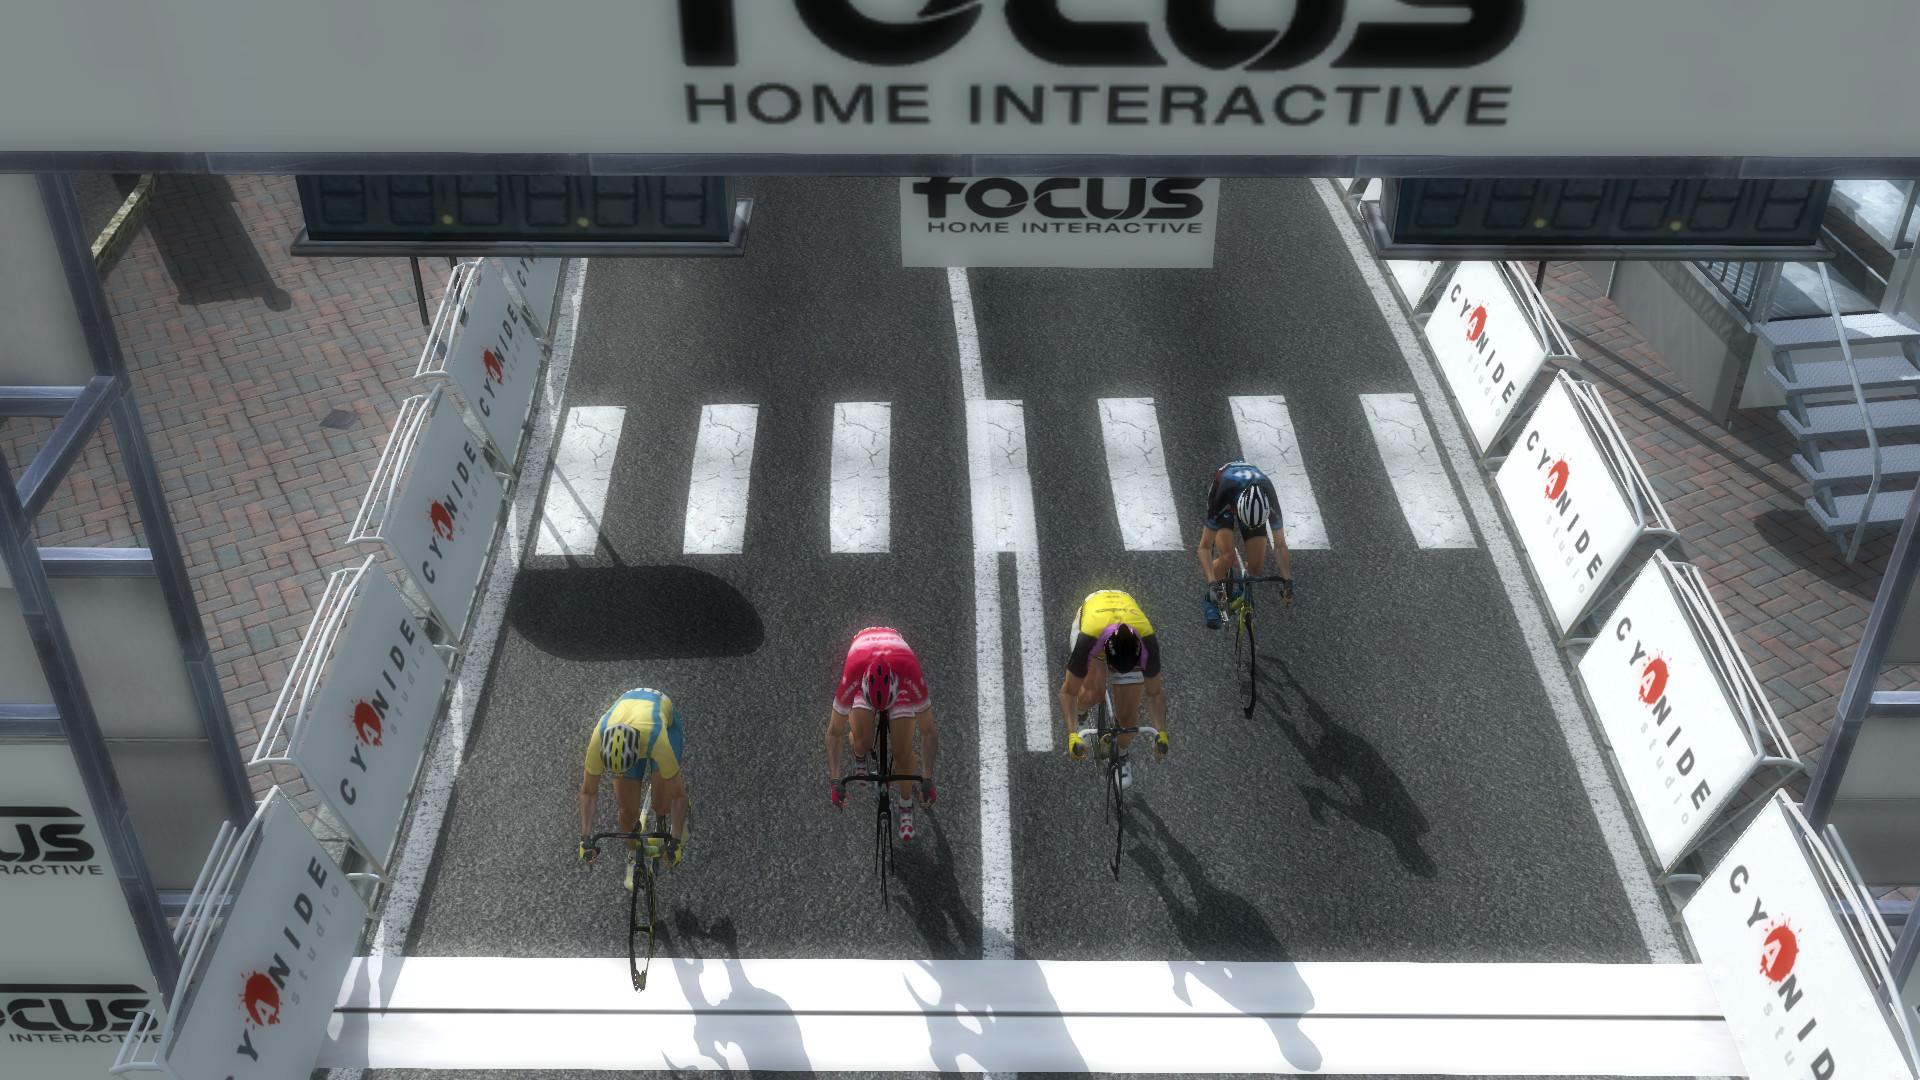 pcmdaily.com/images/mg/2019/Races/C1/Malopolski/47.jpg